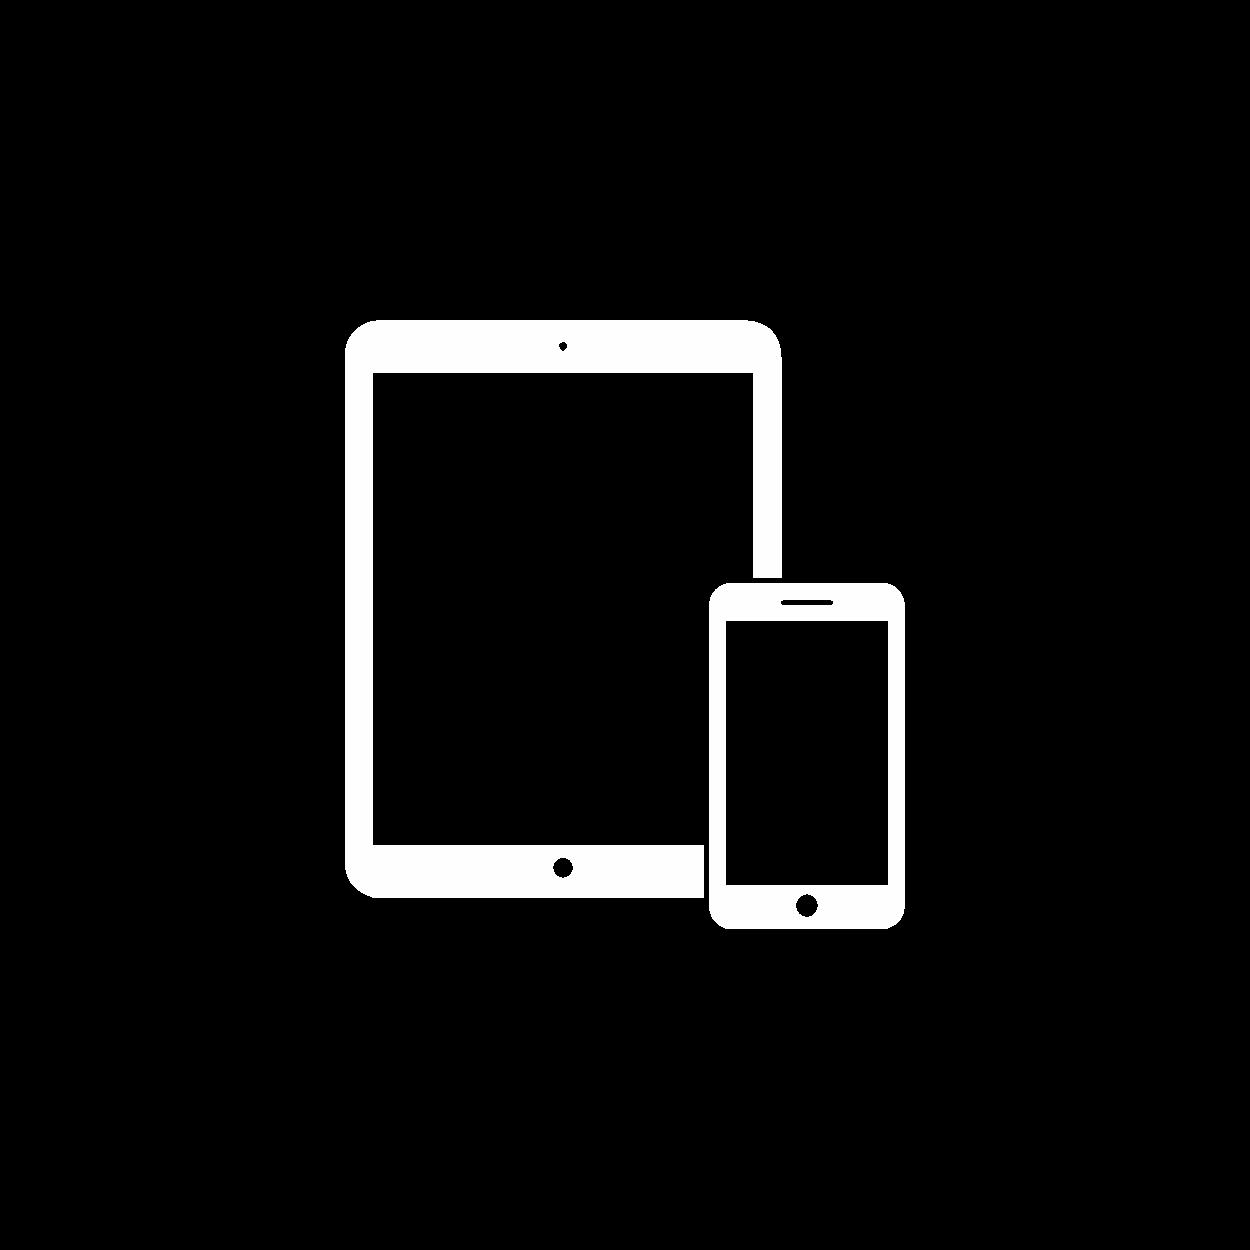 smart phone iphone tablet ipad